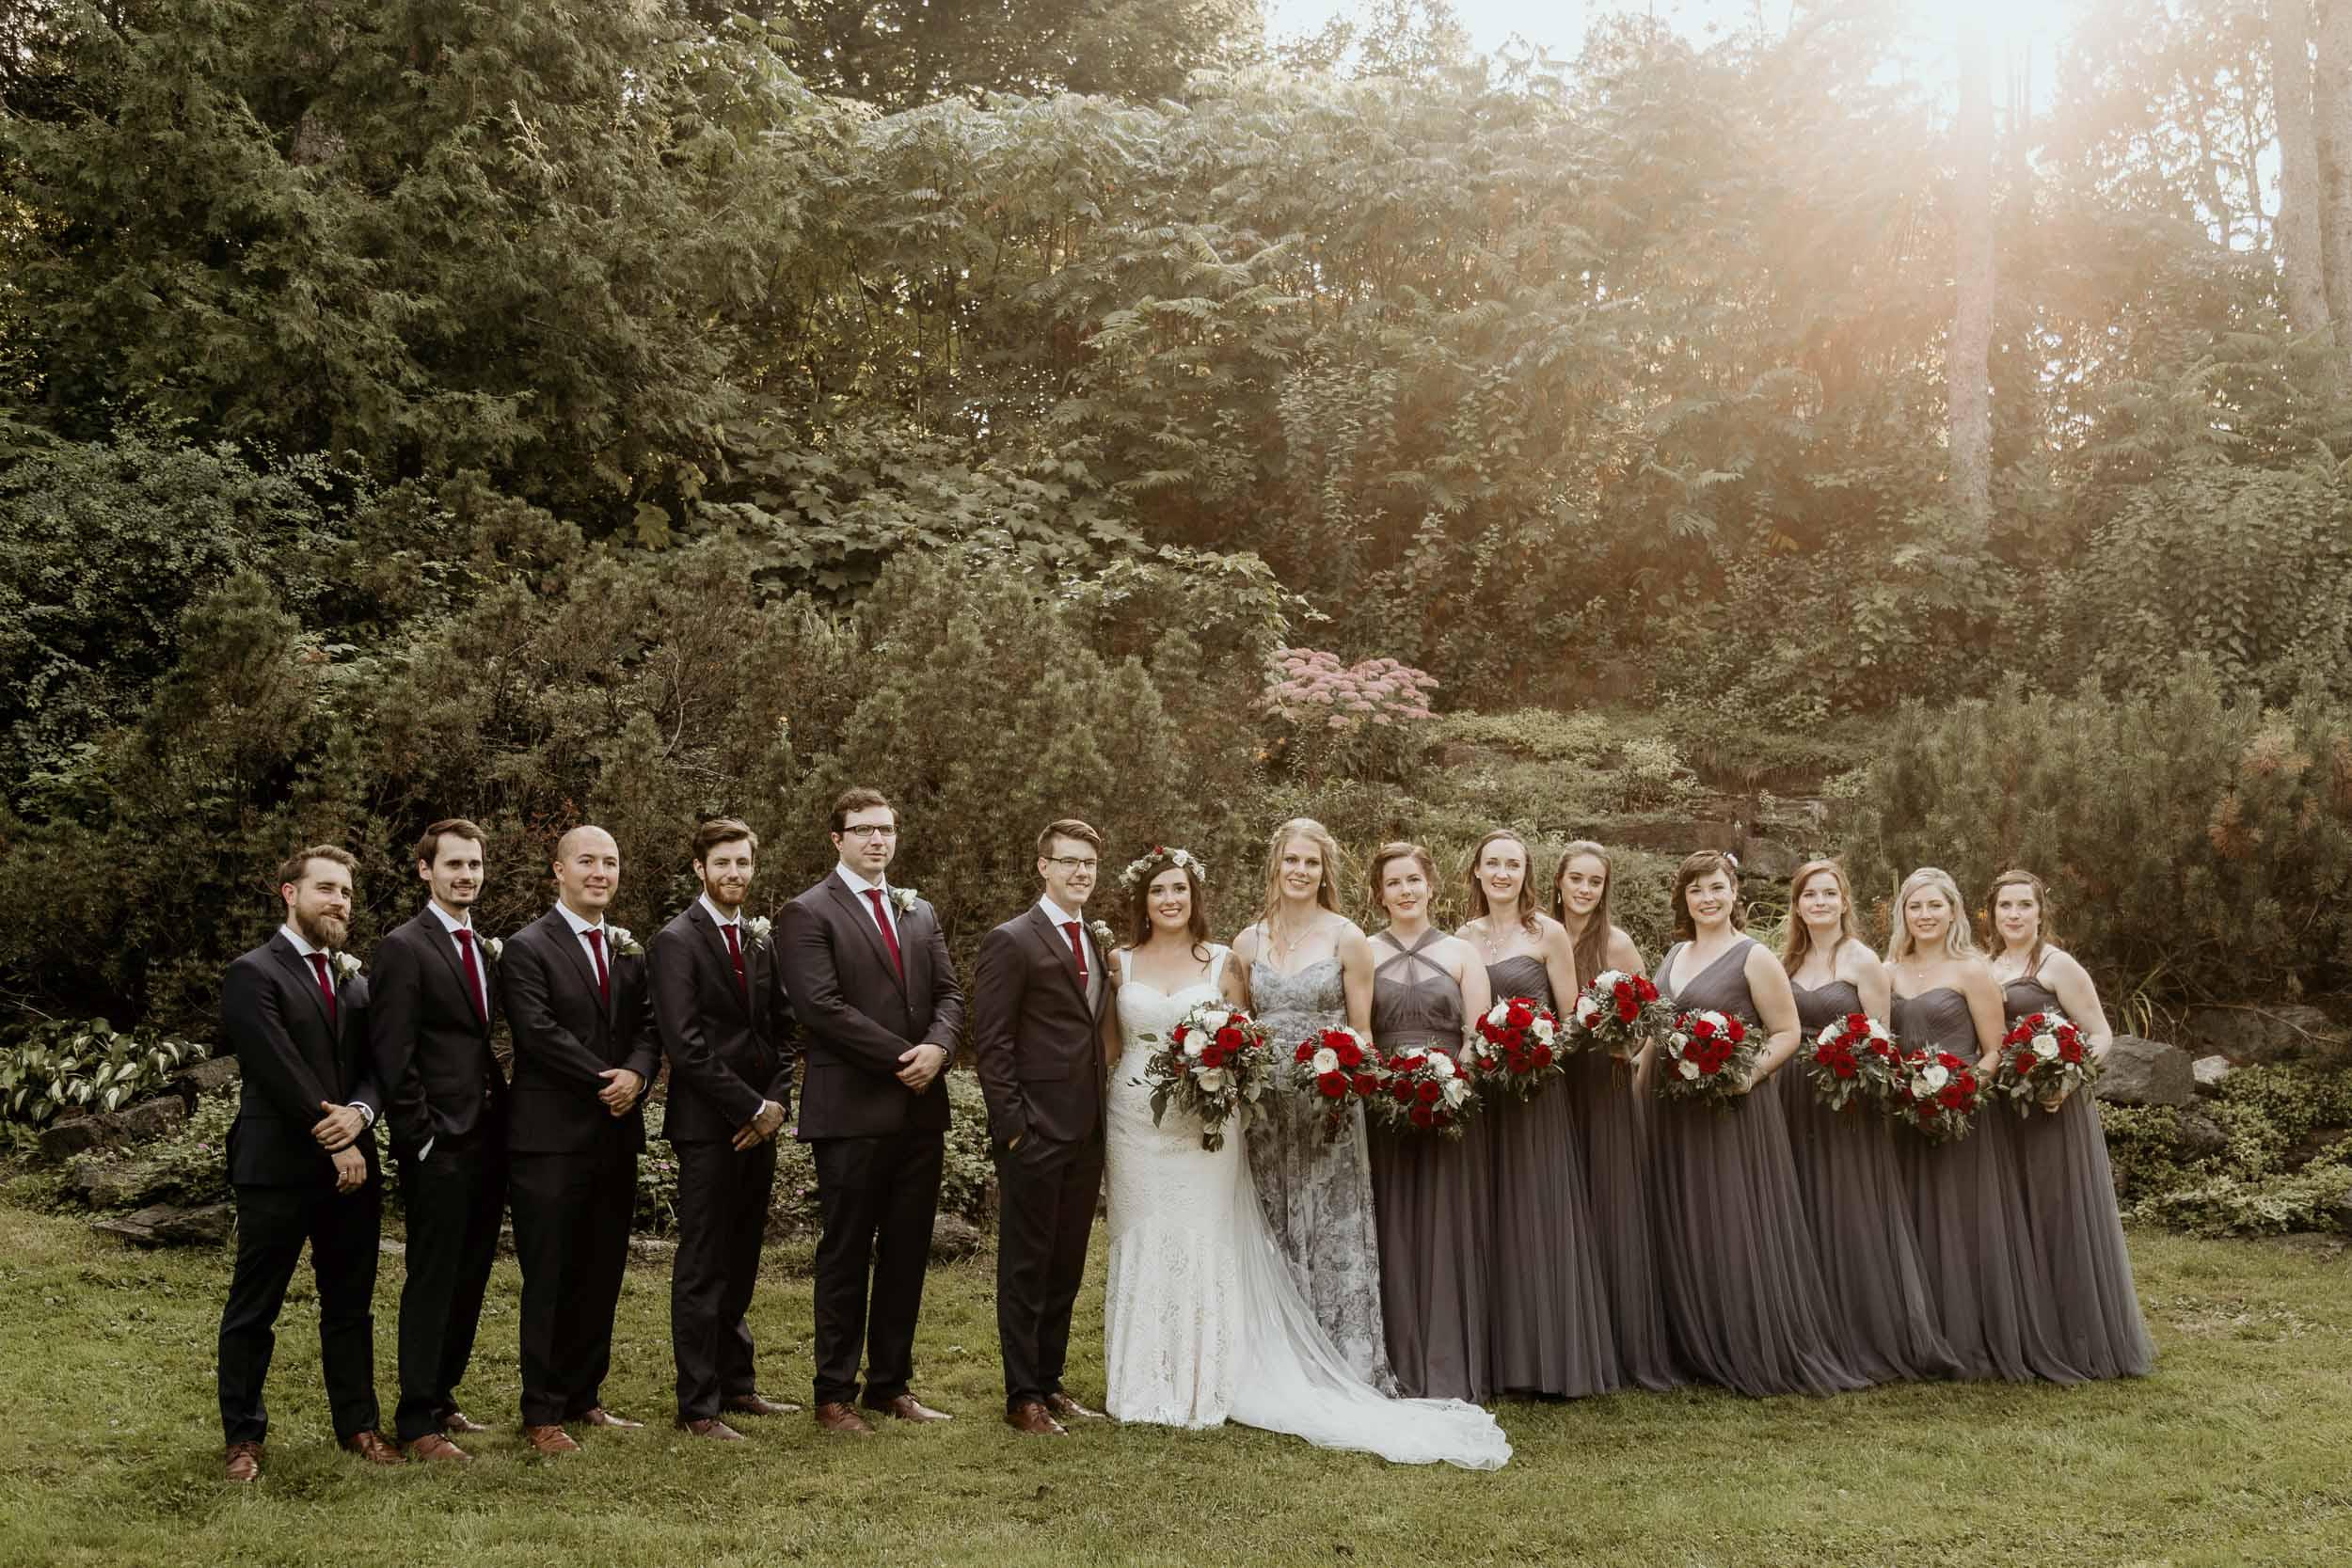 intimate-wedding-elopement-photographer-ottawa-toronto-7447.jpg